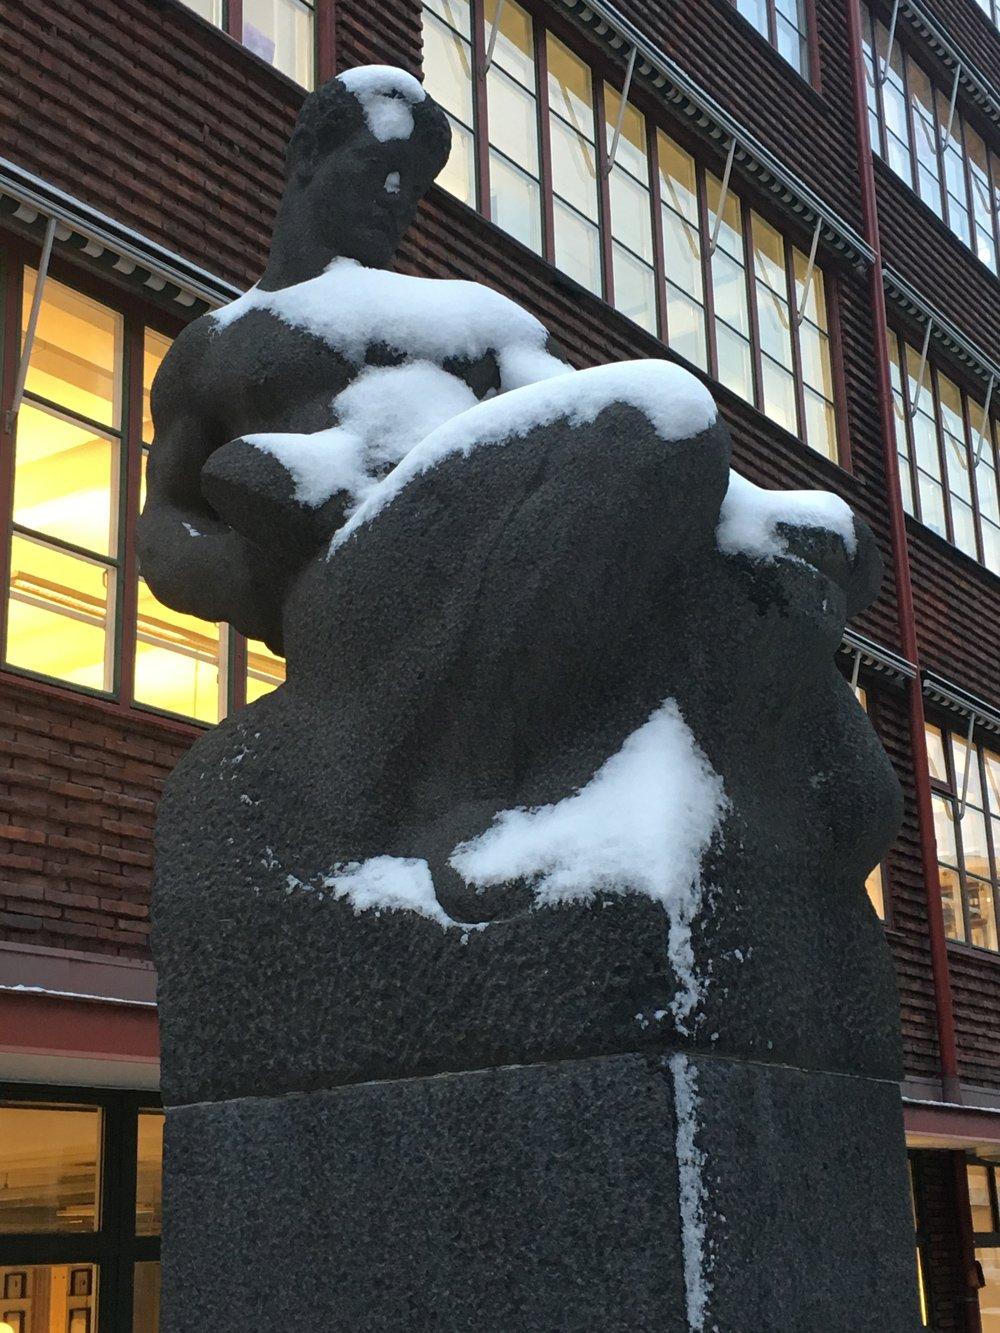 Arbetaren, Mikael Katz, Gävlegatan / Hudiksvallsgatan